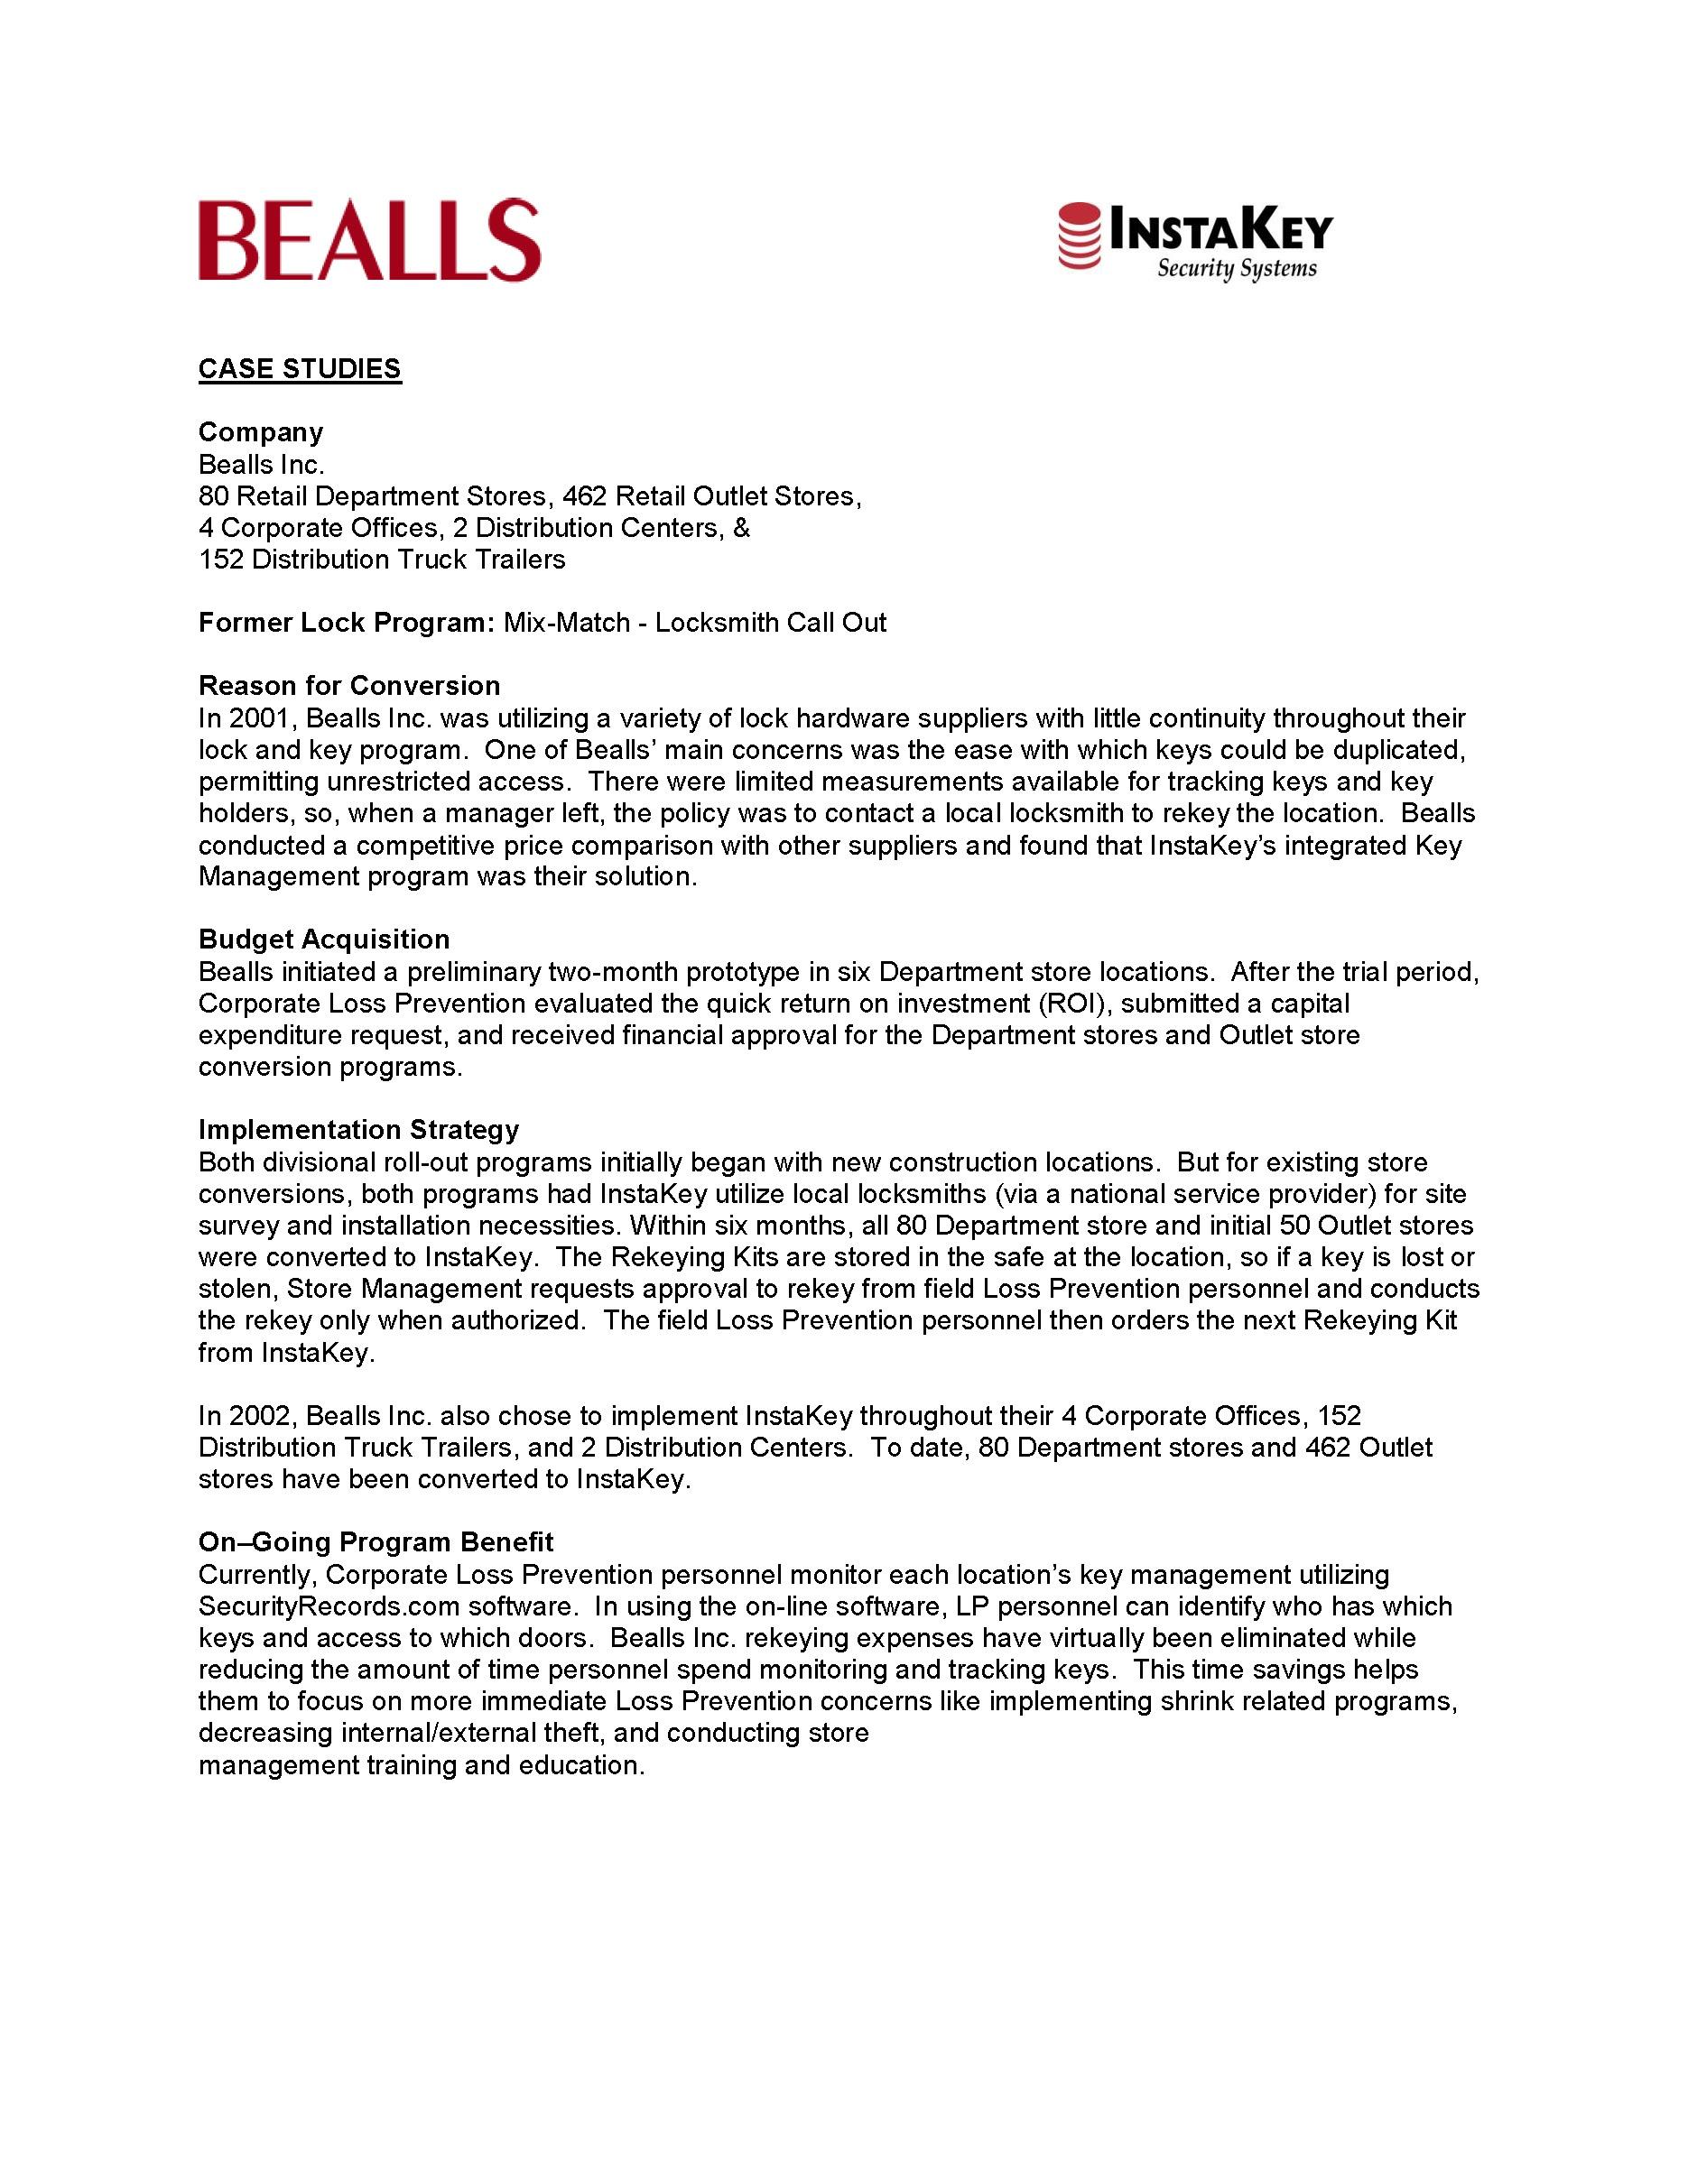 Bealls – A Case Study